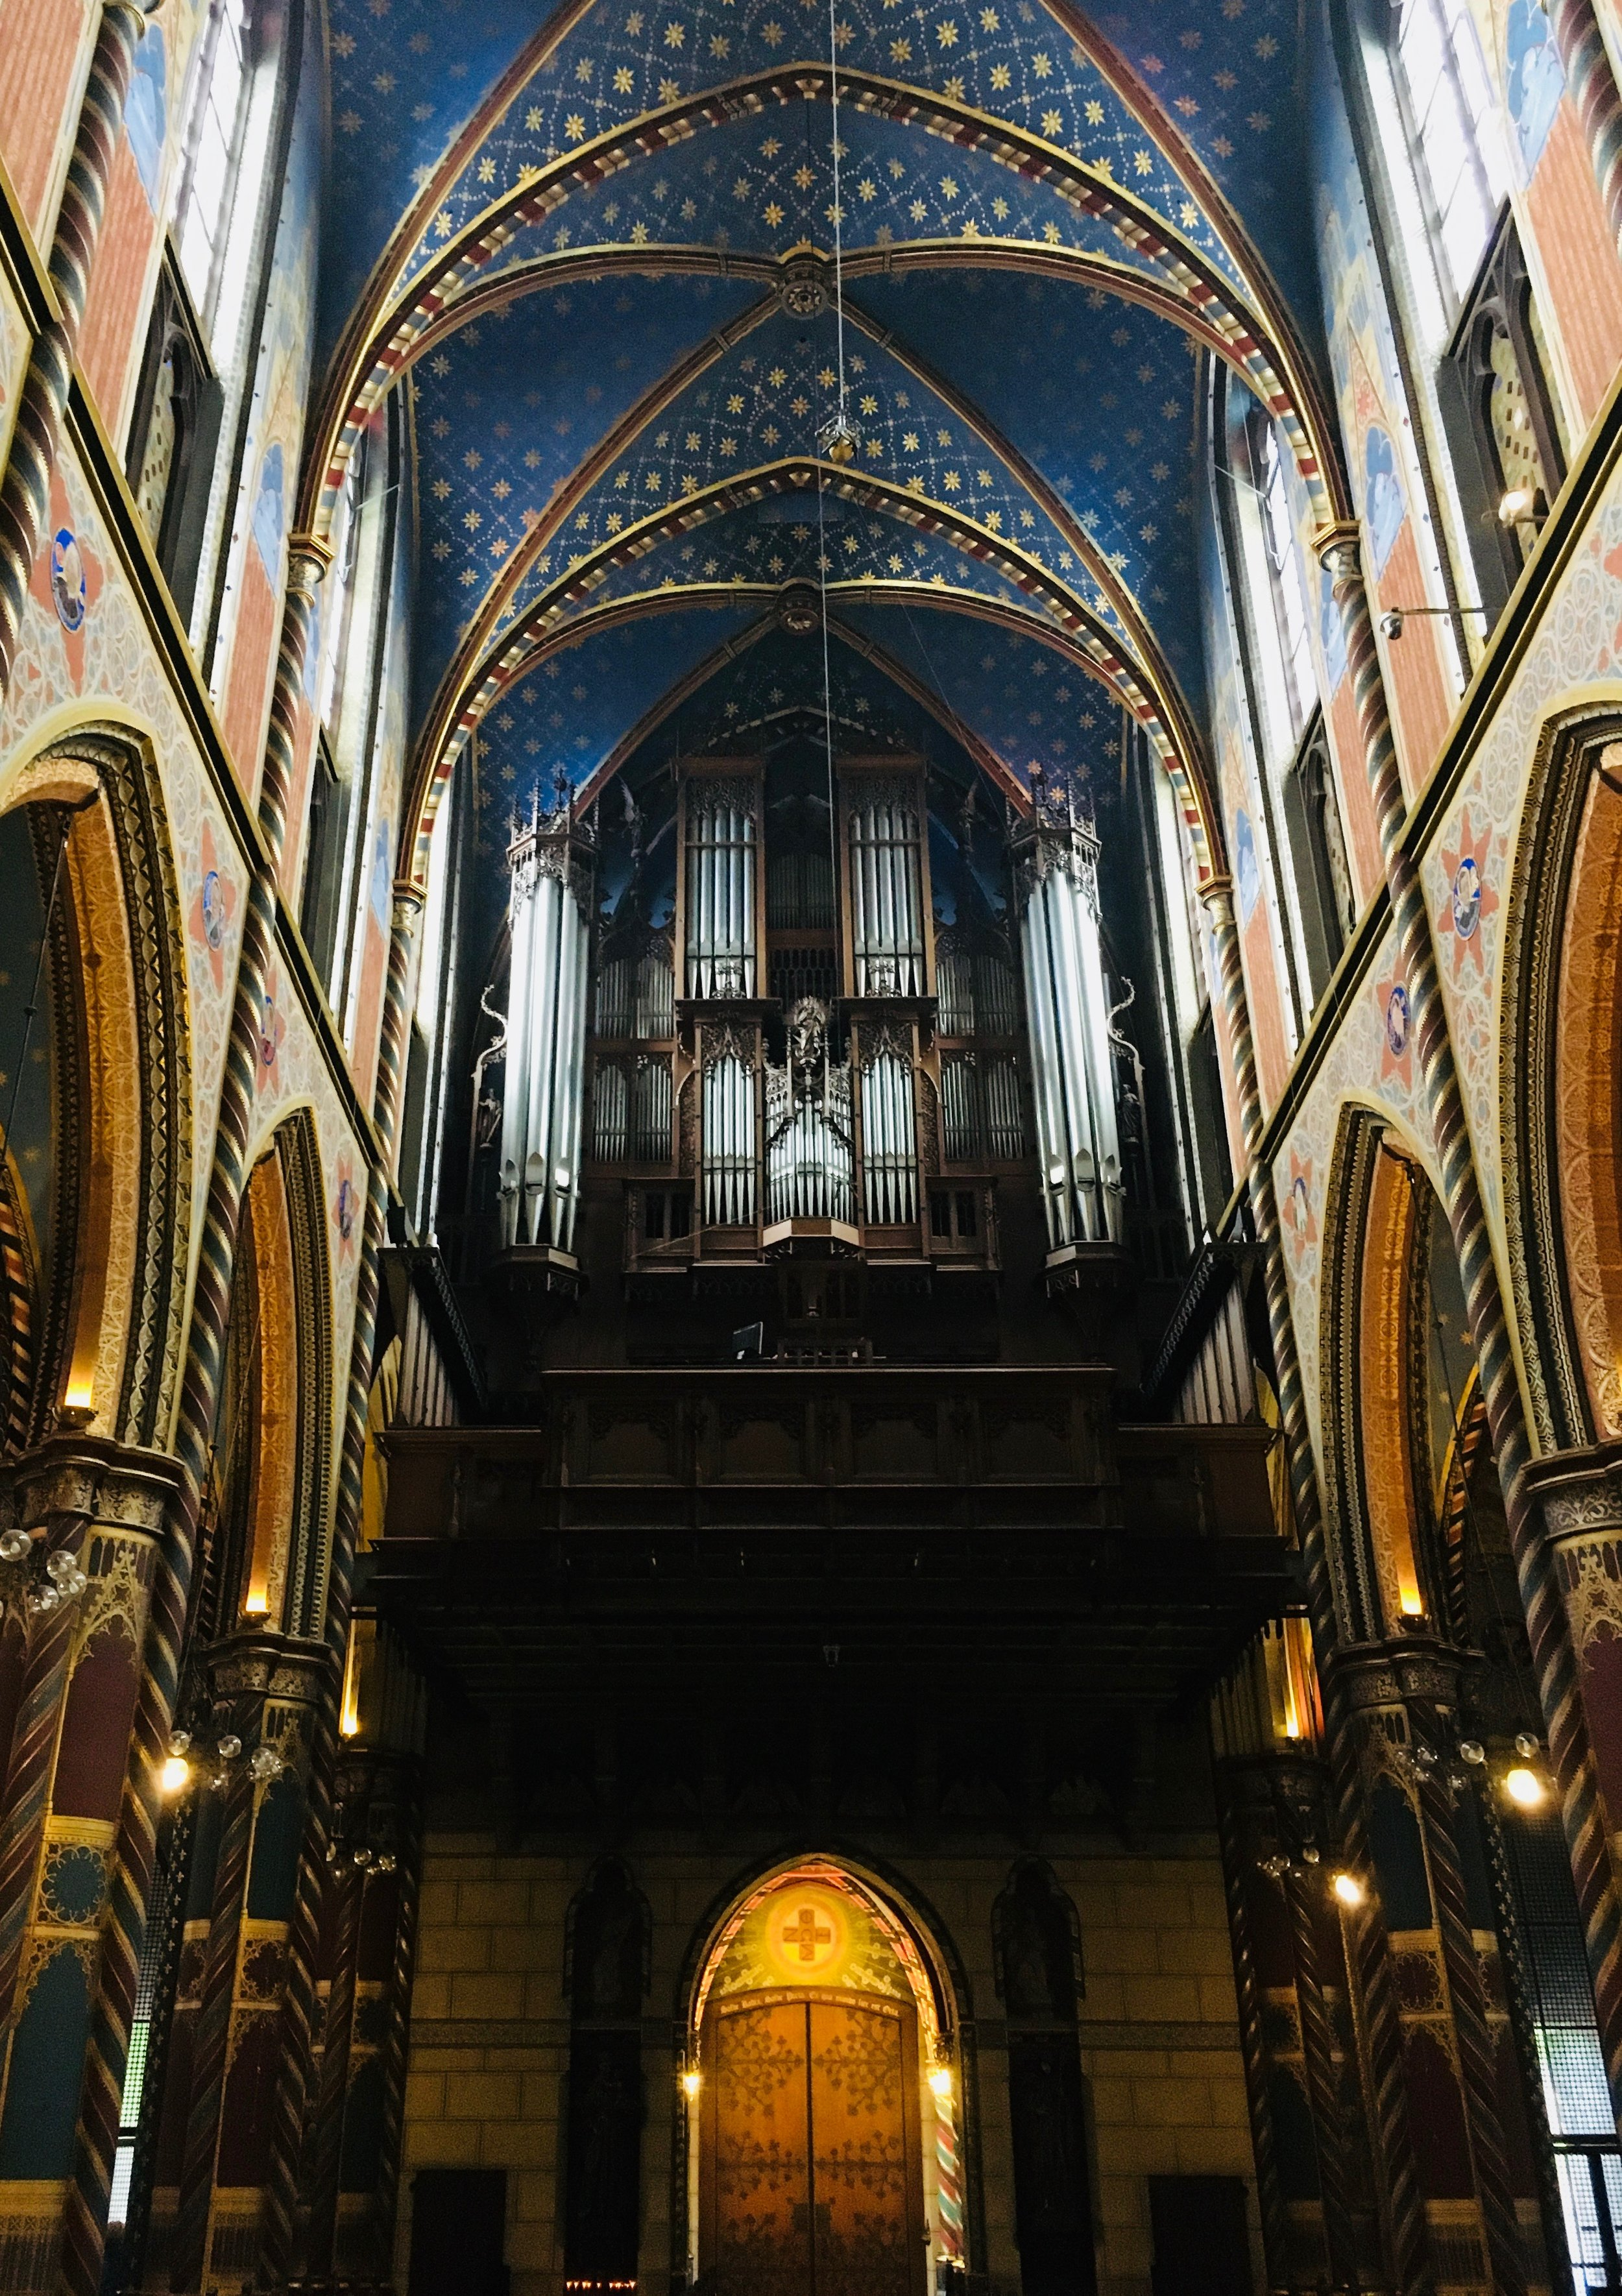 Boston Organ Studio member visits the romantic organ in Kevalaer, enroute to meeting the group in Amsterdam.